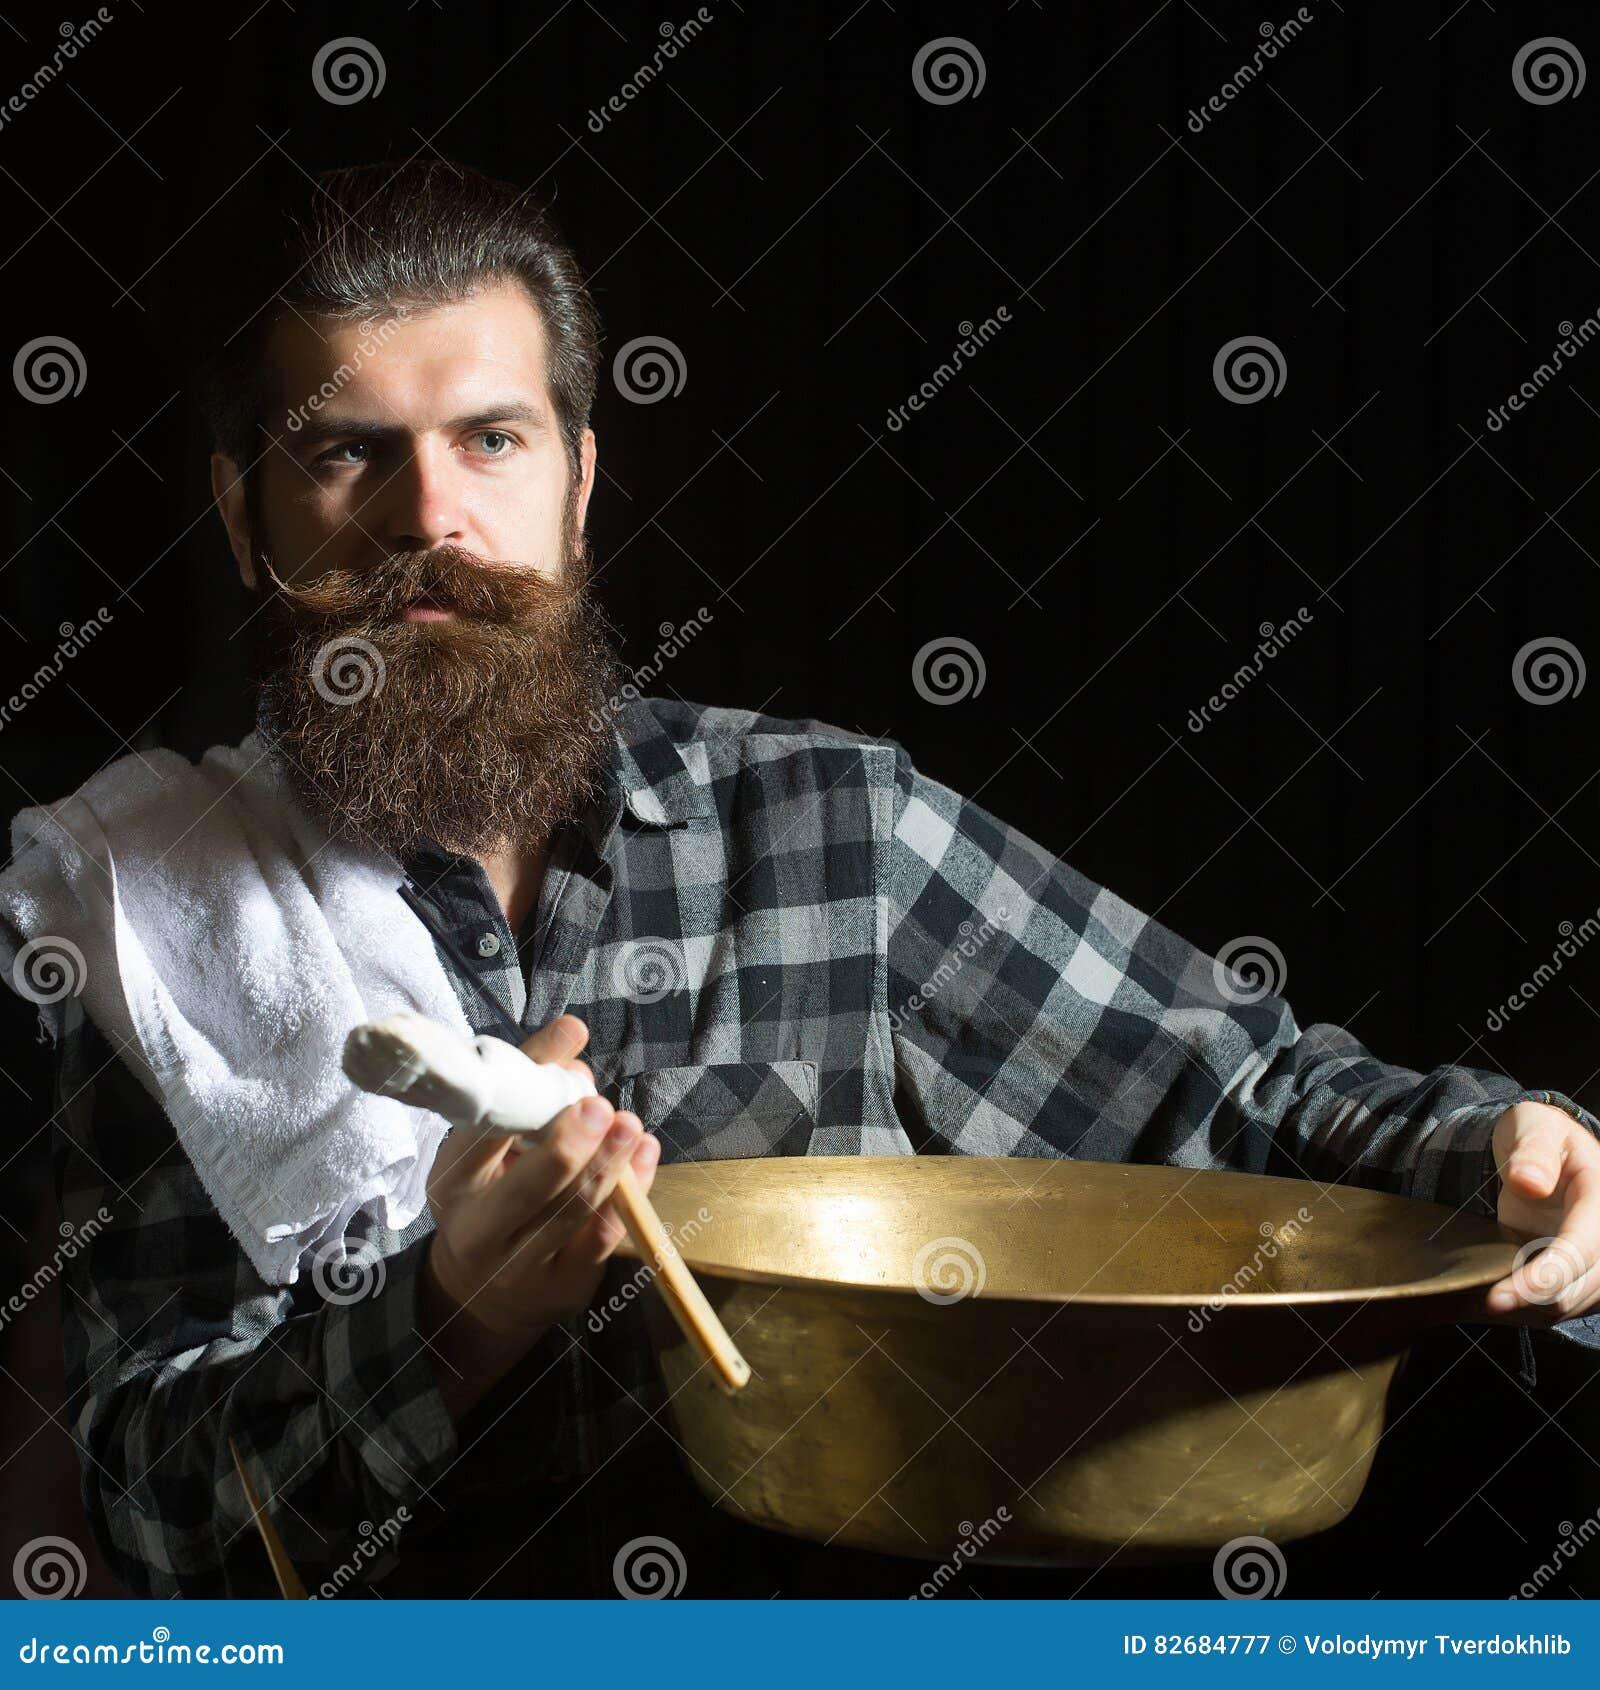 Bearded man shaves with razor